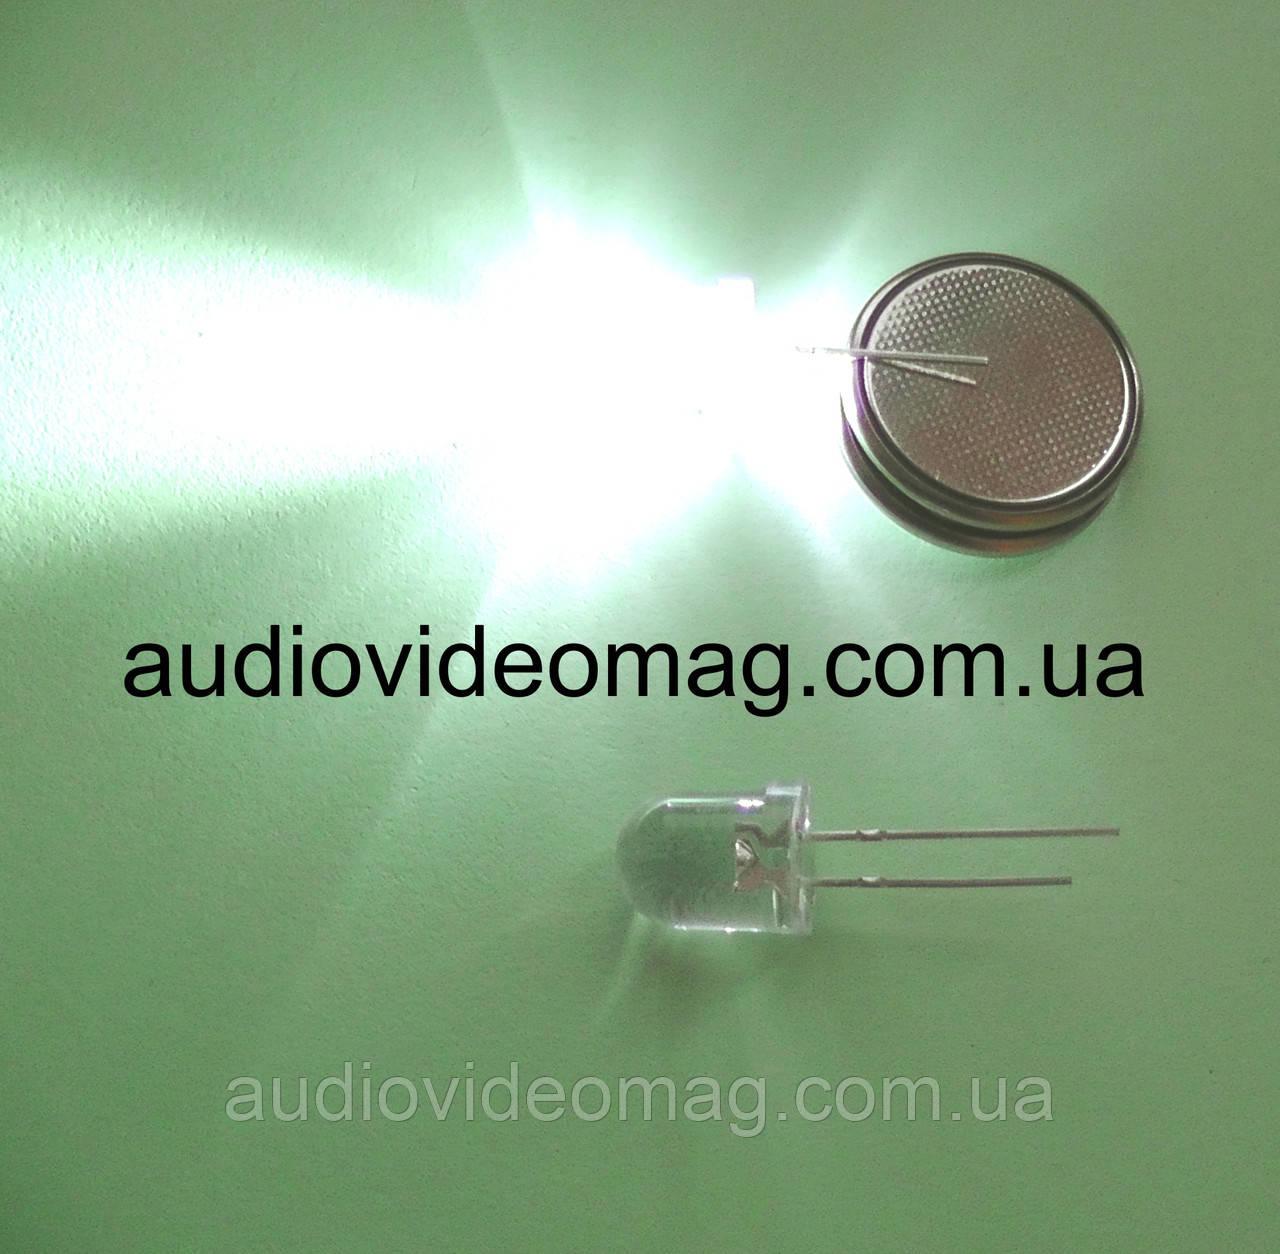 Светодиод 3V 8х11 мм, прозрачный, цвет белый